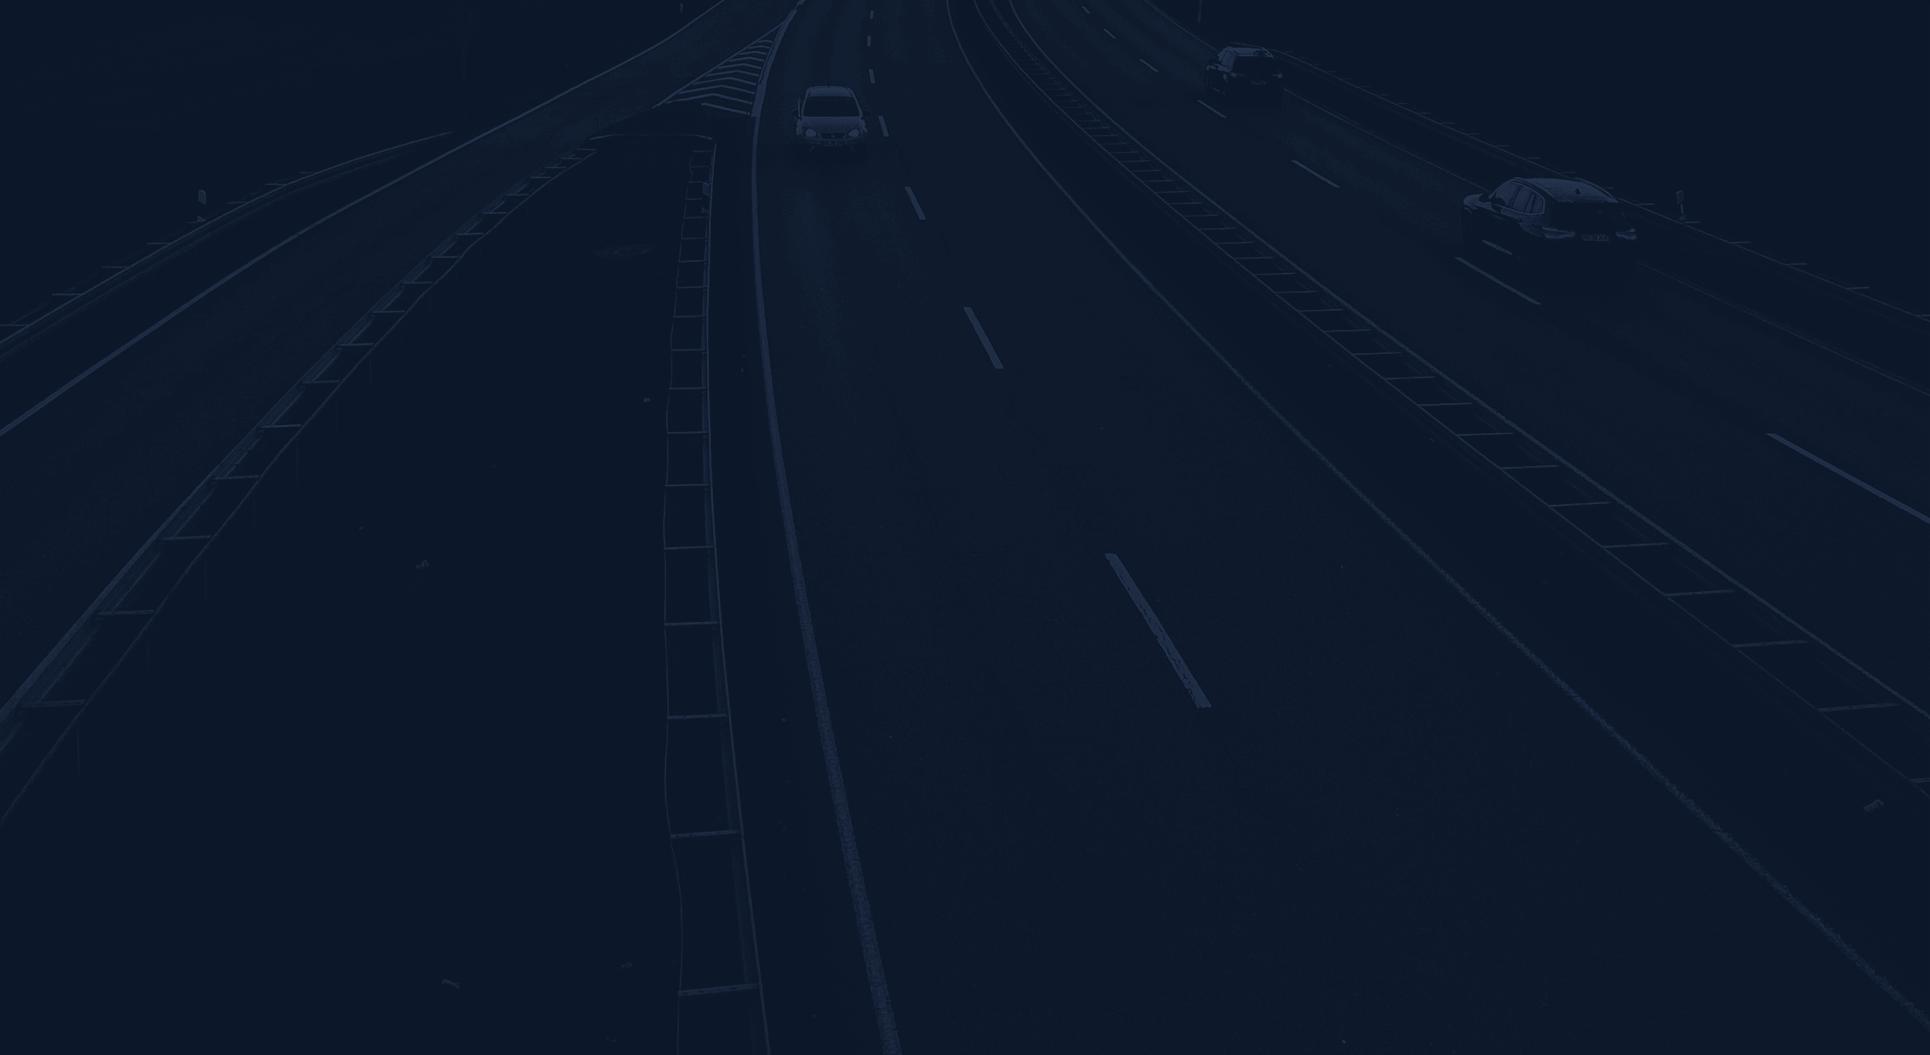 atrom e-toll hero header compressed